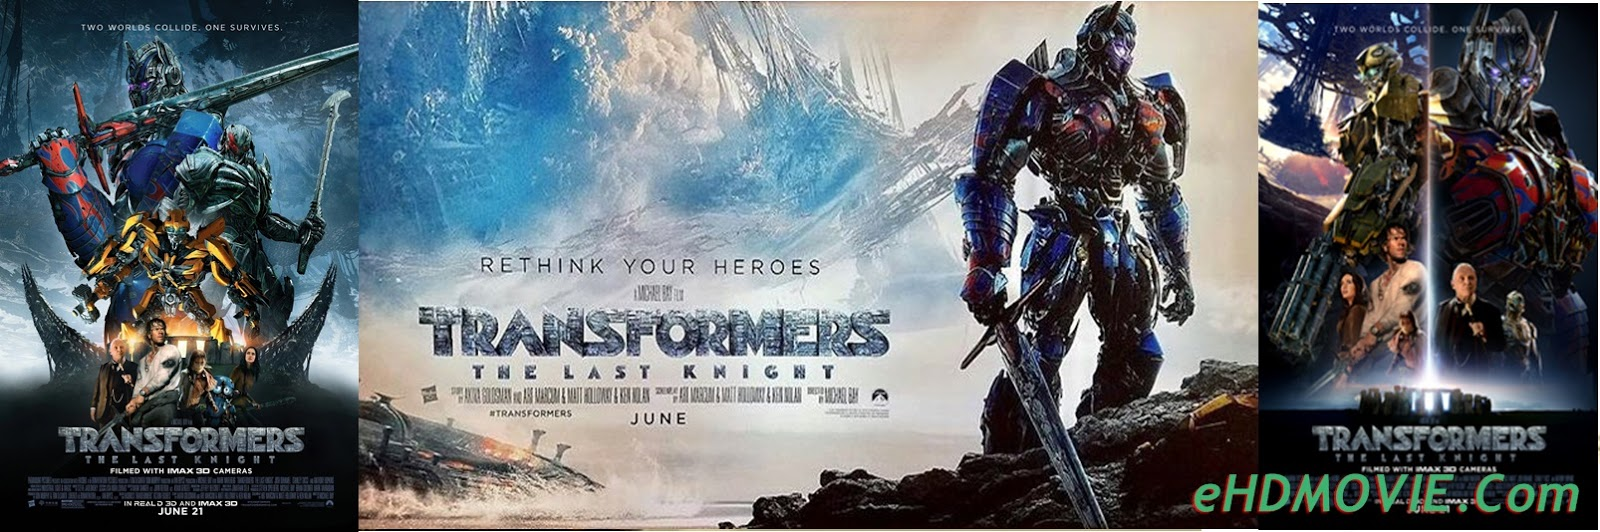 Transformers The Last Knight 2017 Full Movie Dual Audio [Hindi – English] 1080p - 720p – 480p ORG BRRip 500MB – 1.3GB - 2.5GB ESubs Free Download